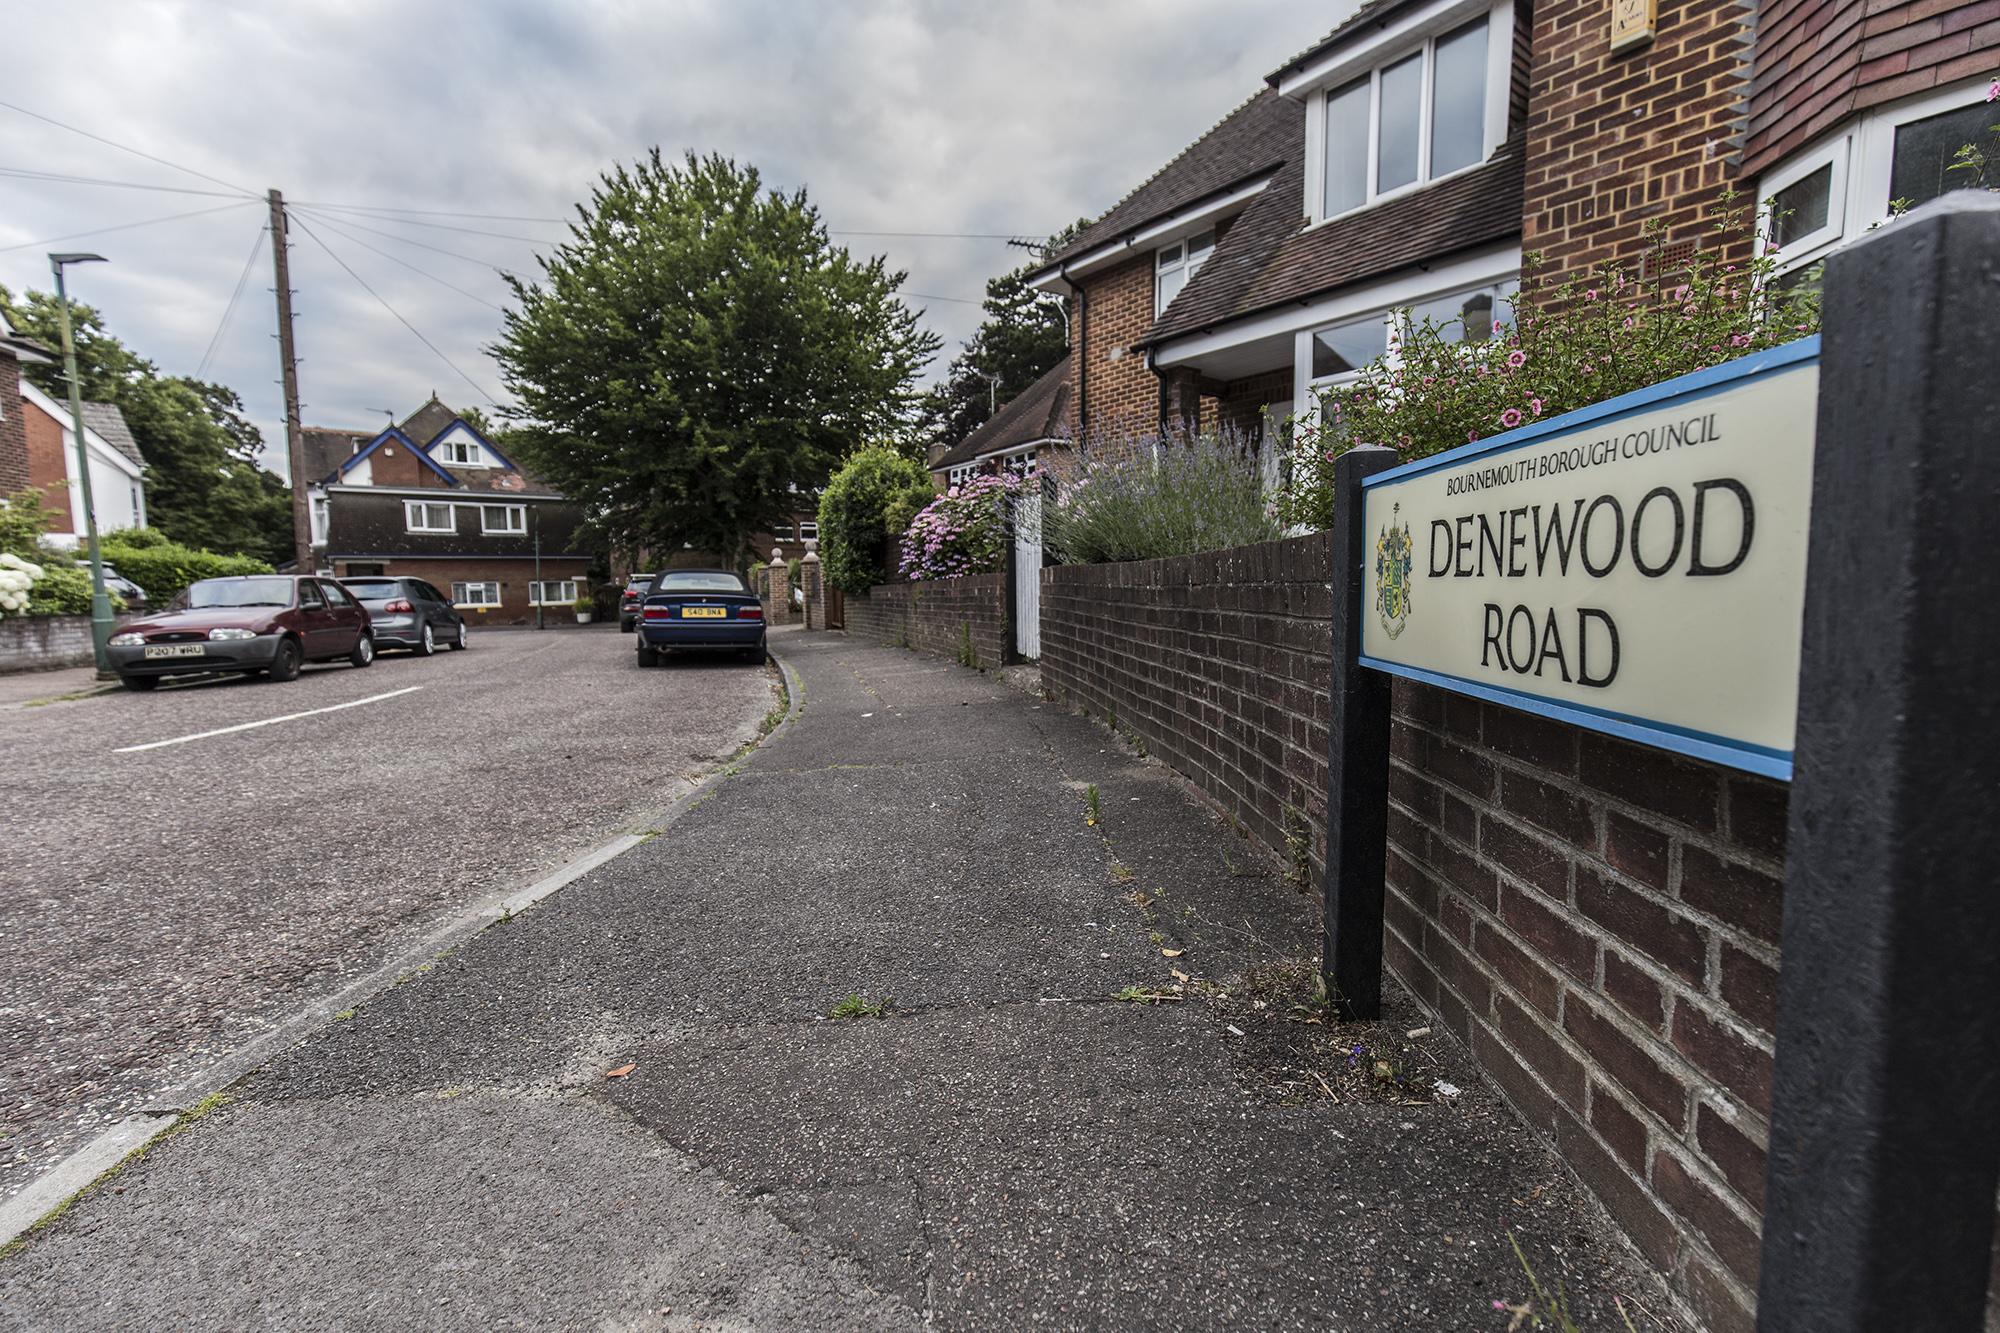 Denewood Road, Westbourne